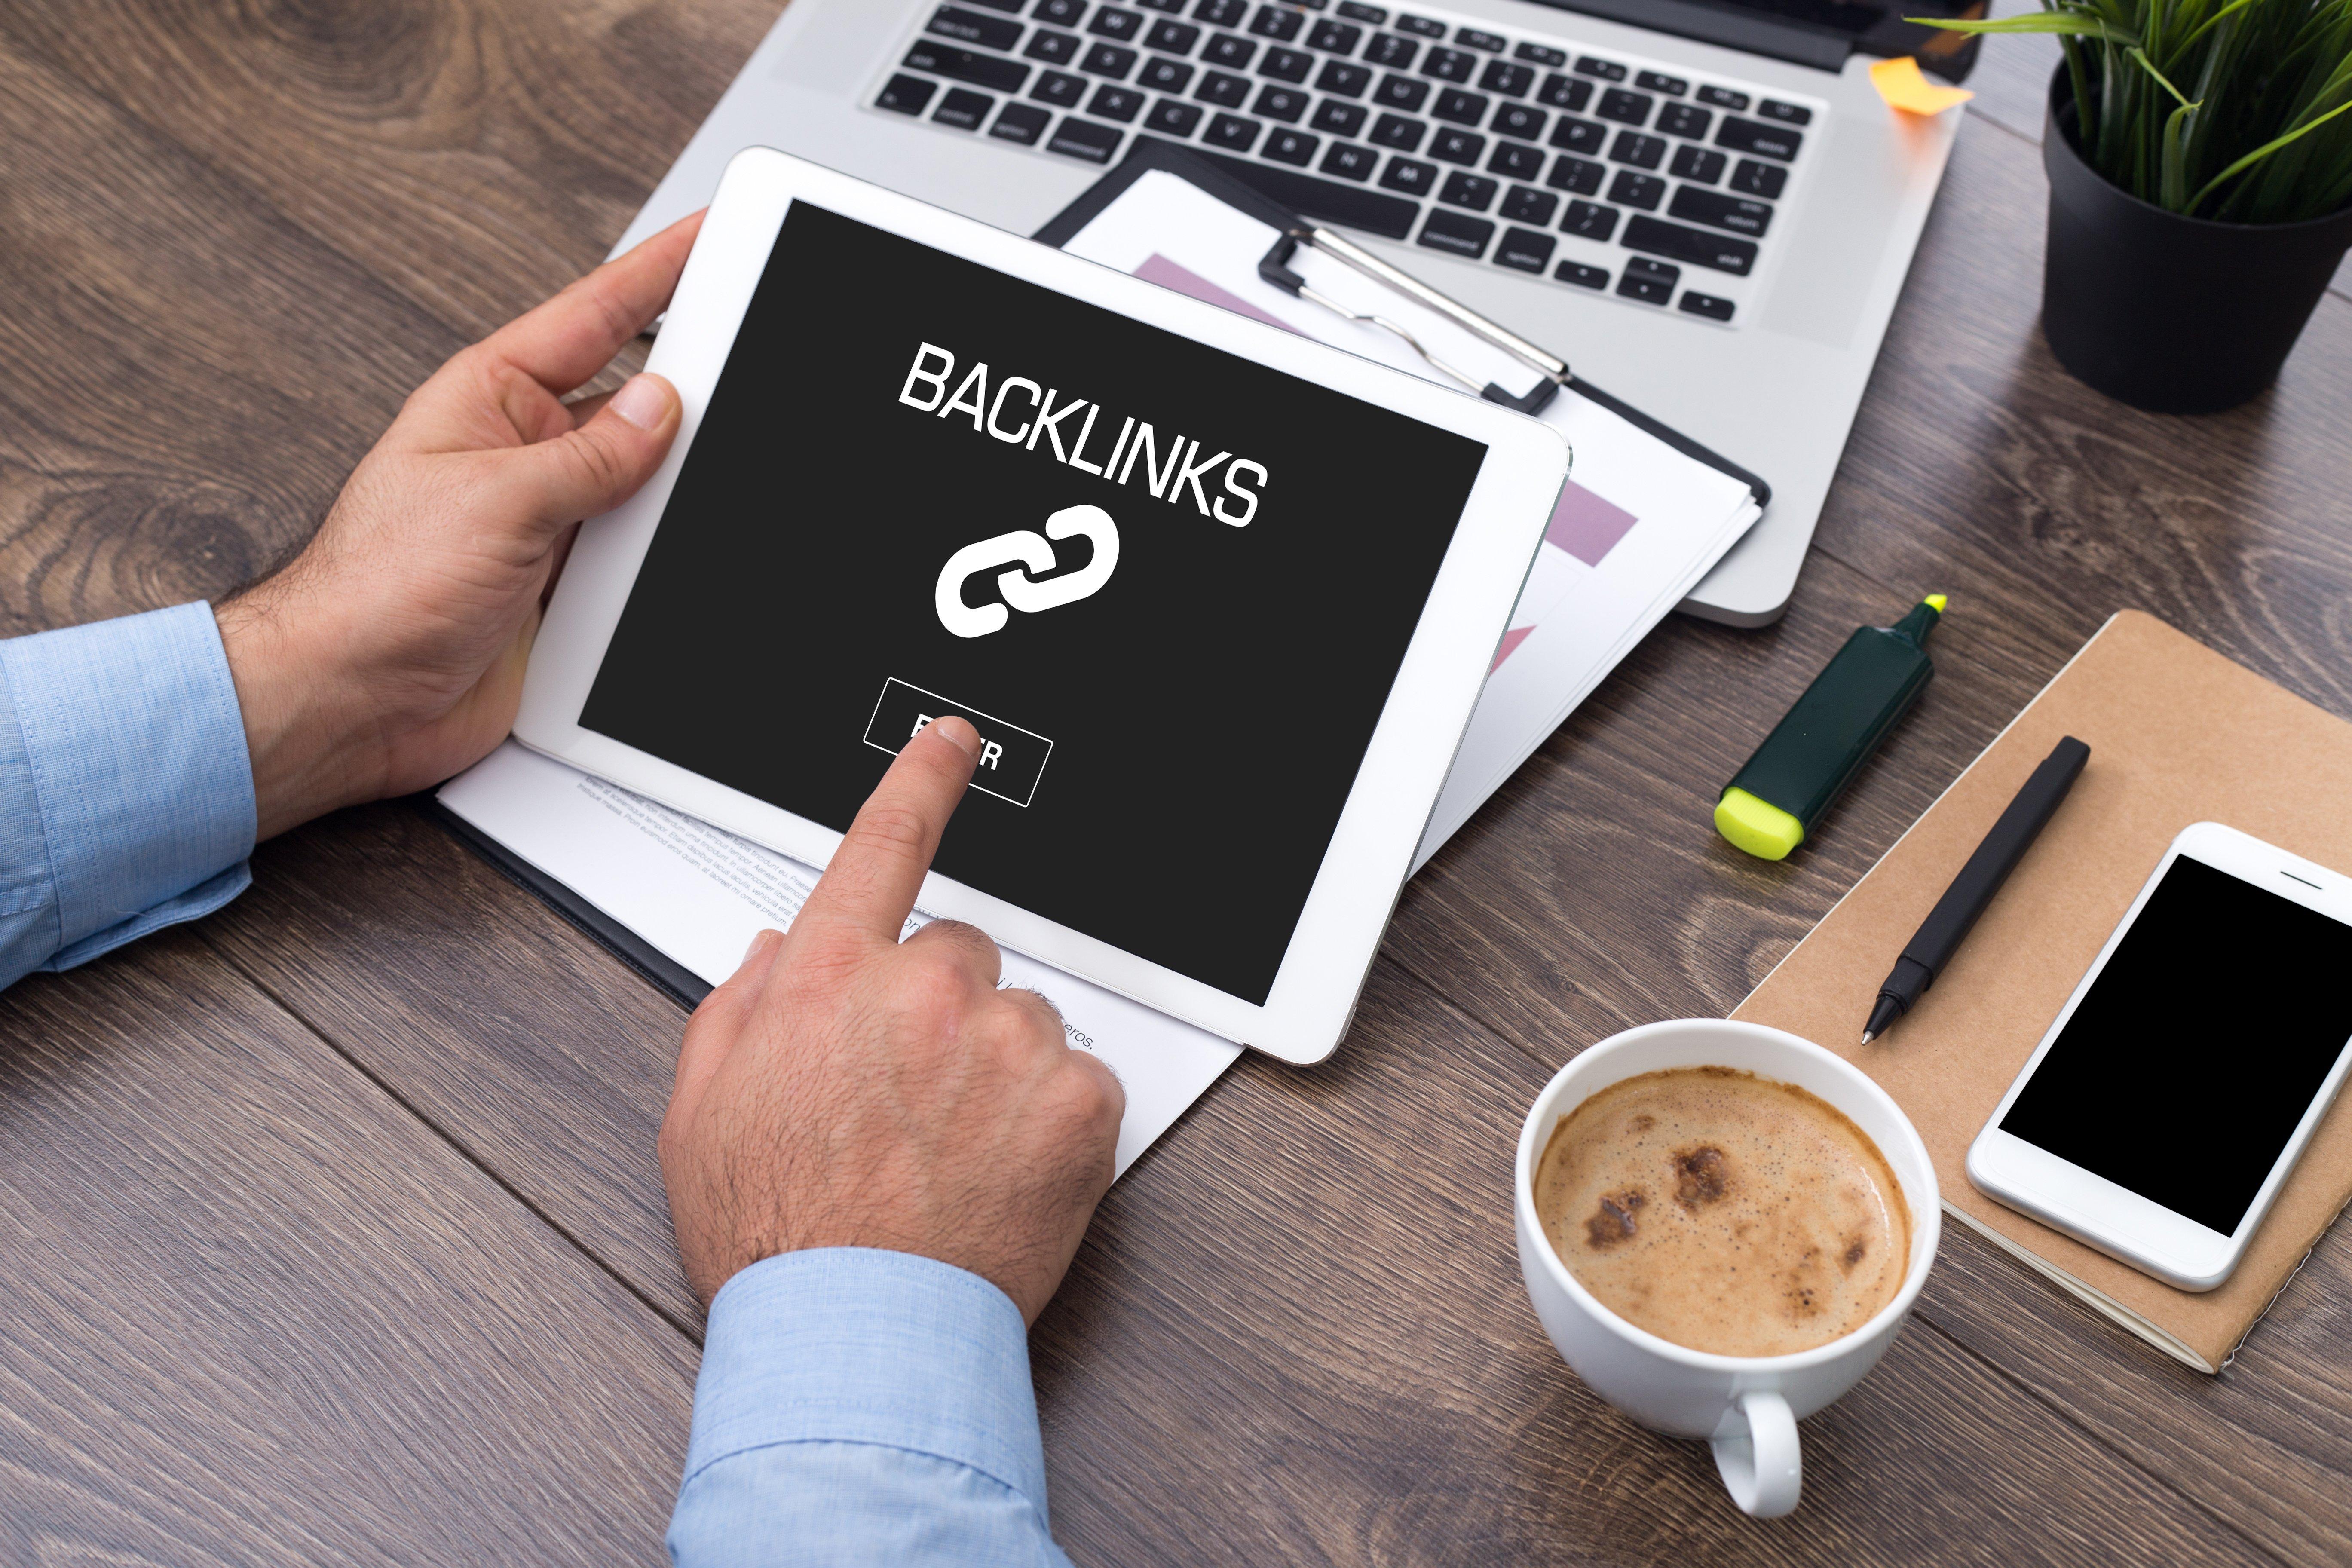 backlinks-and-seo4